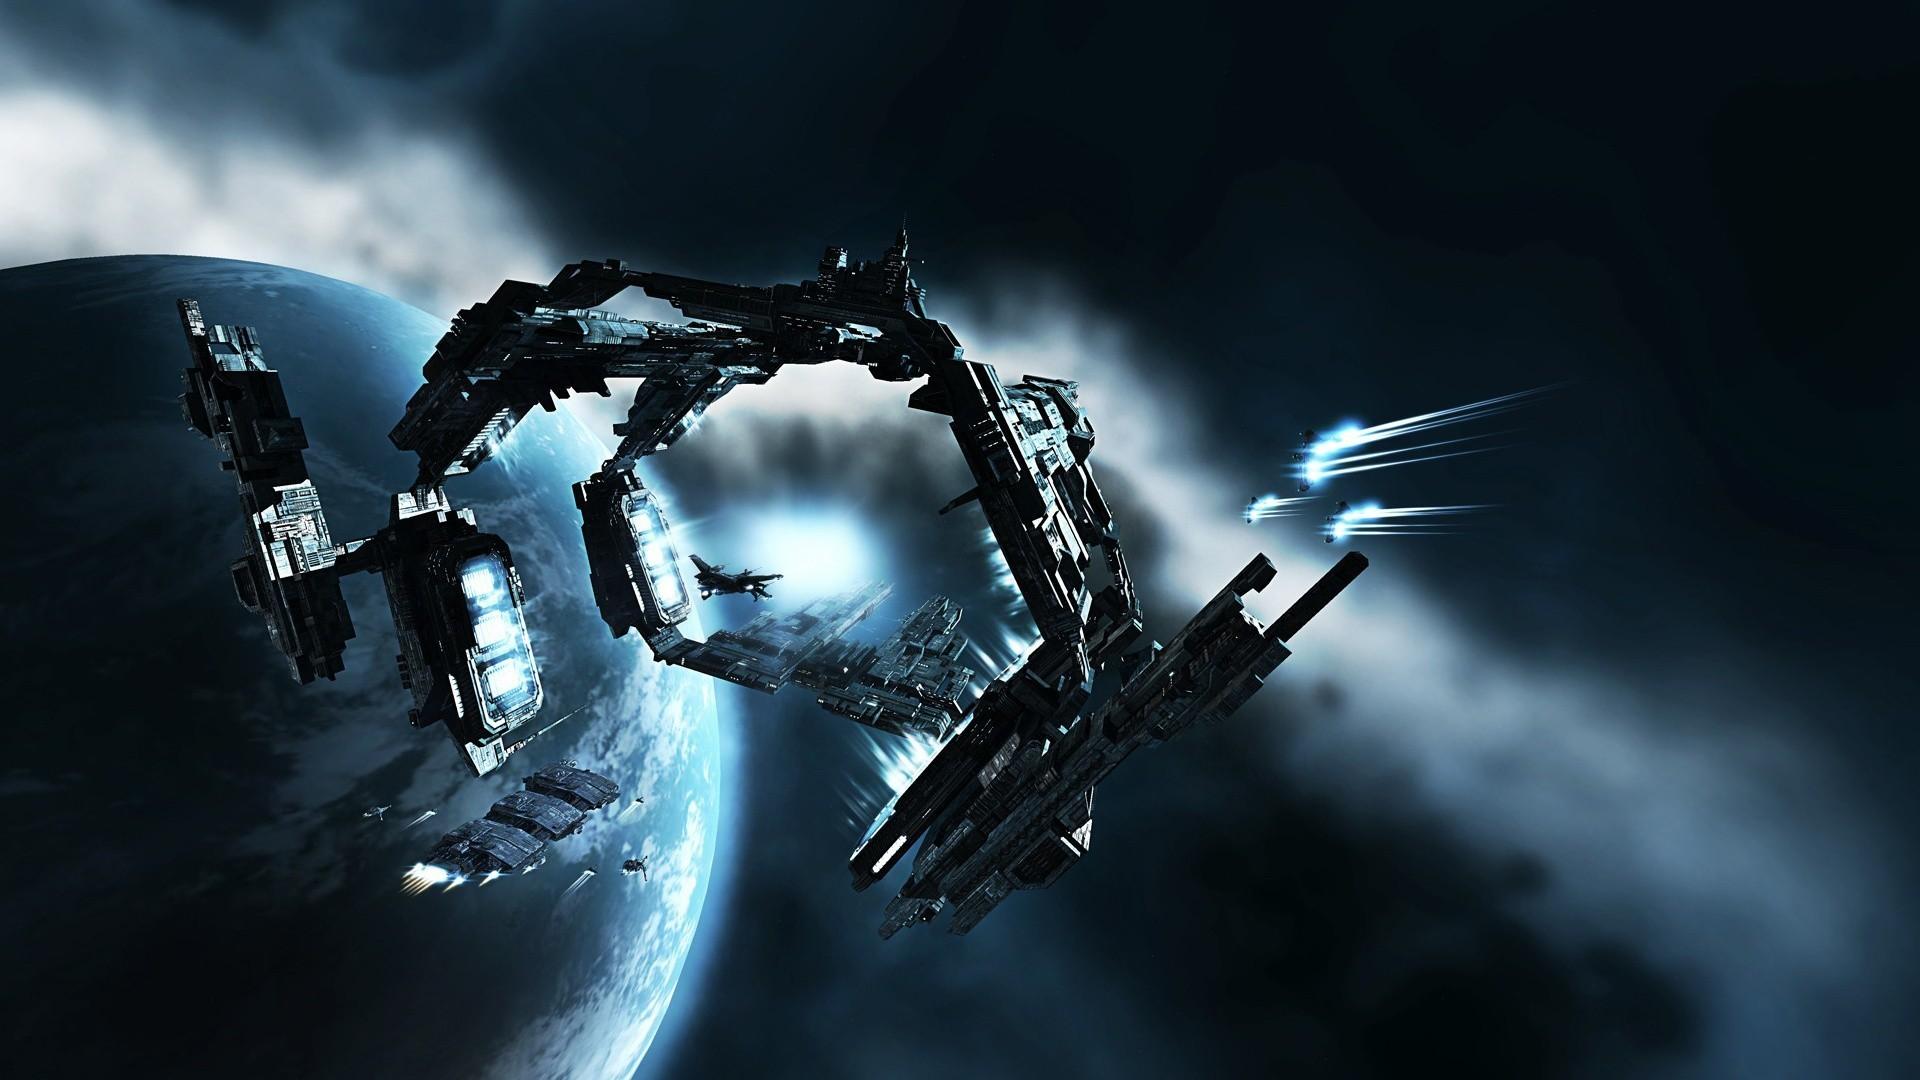 Eve Online Wallpaper Eve, Online, Spaceships, Vehicles